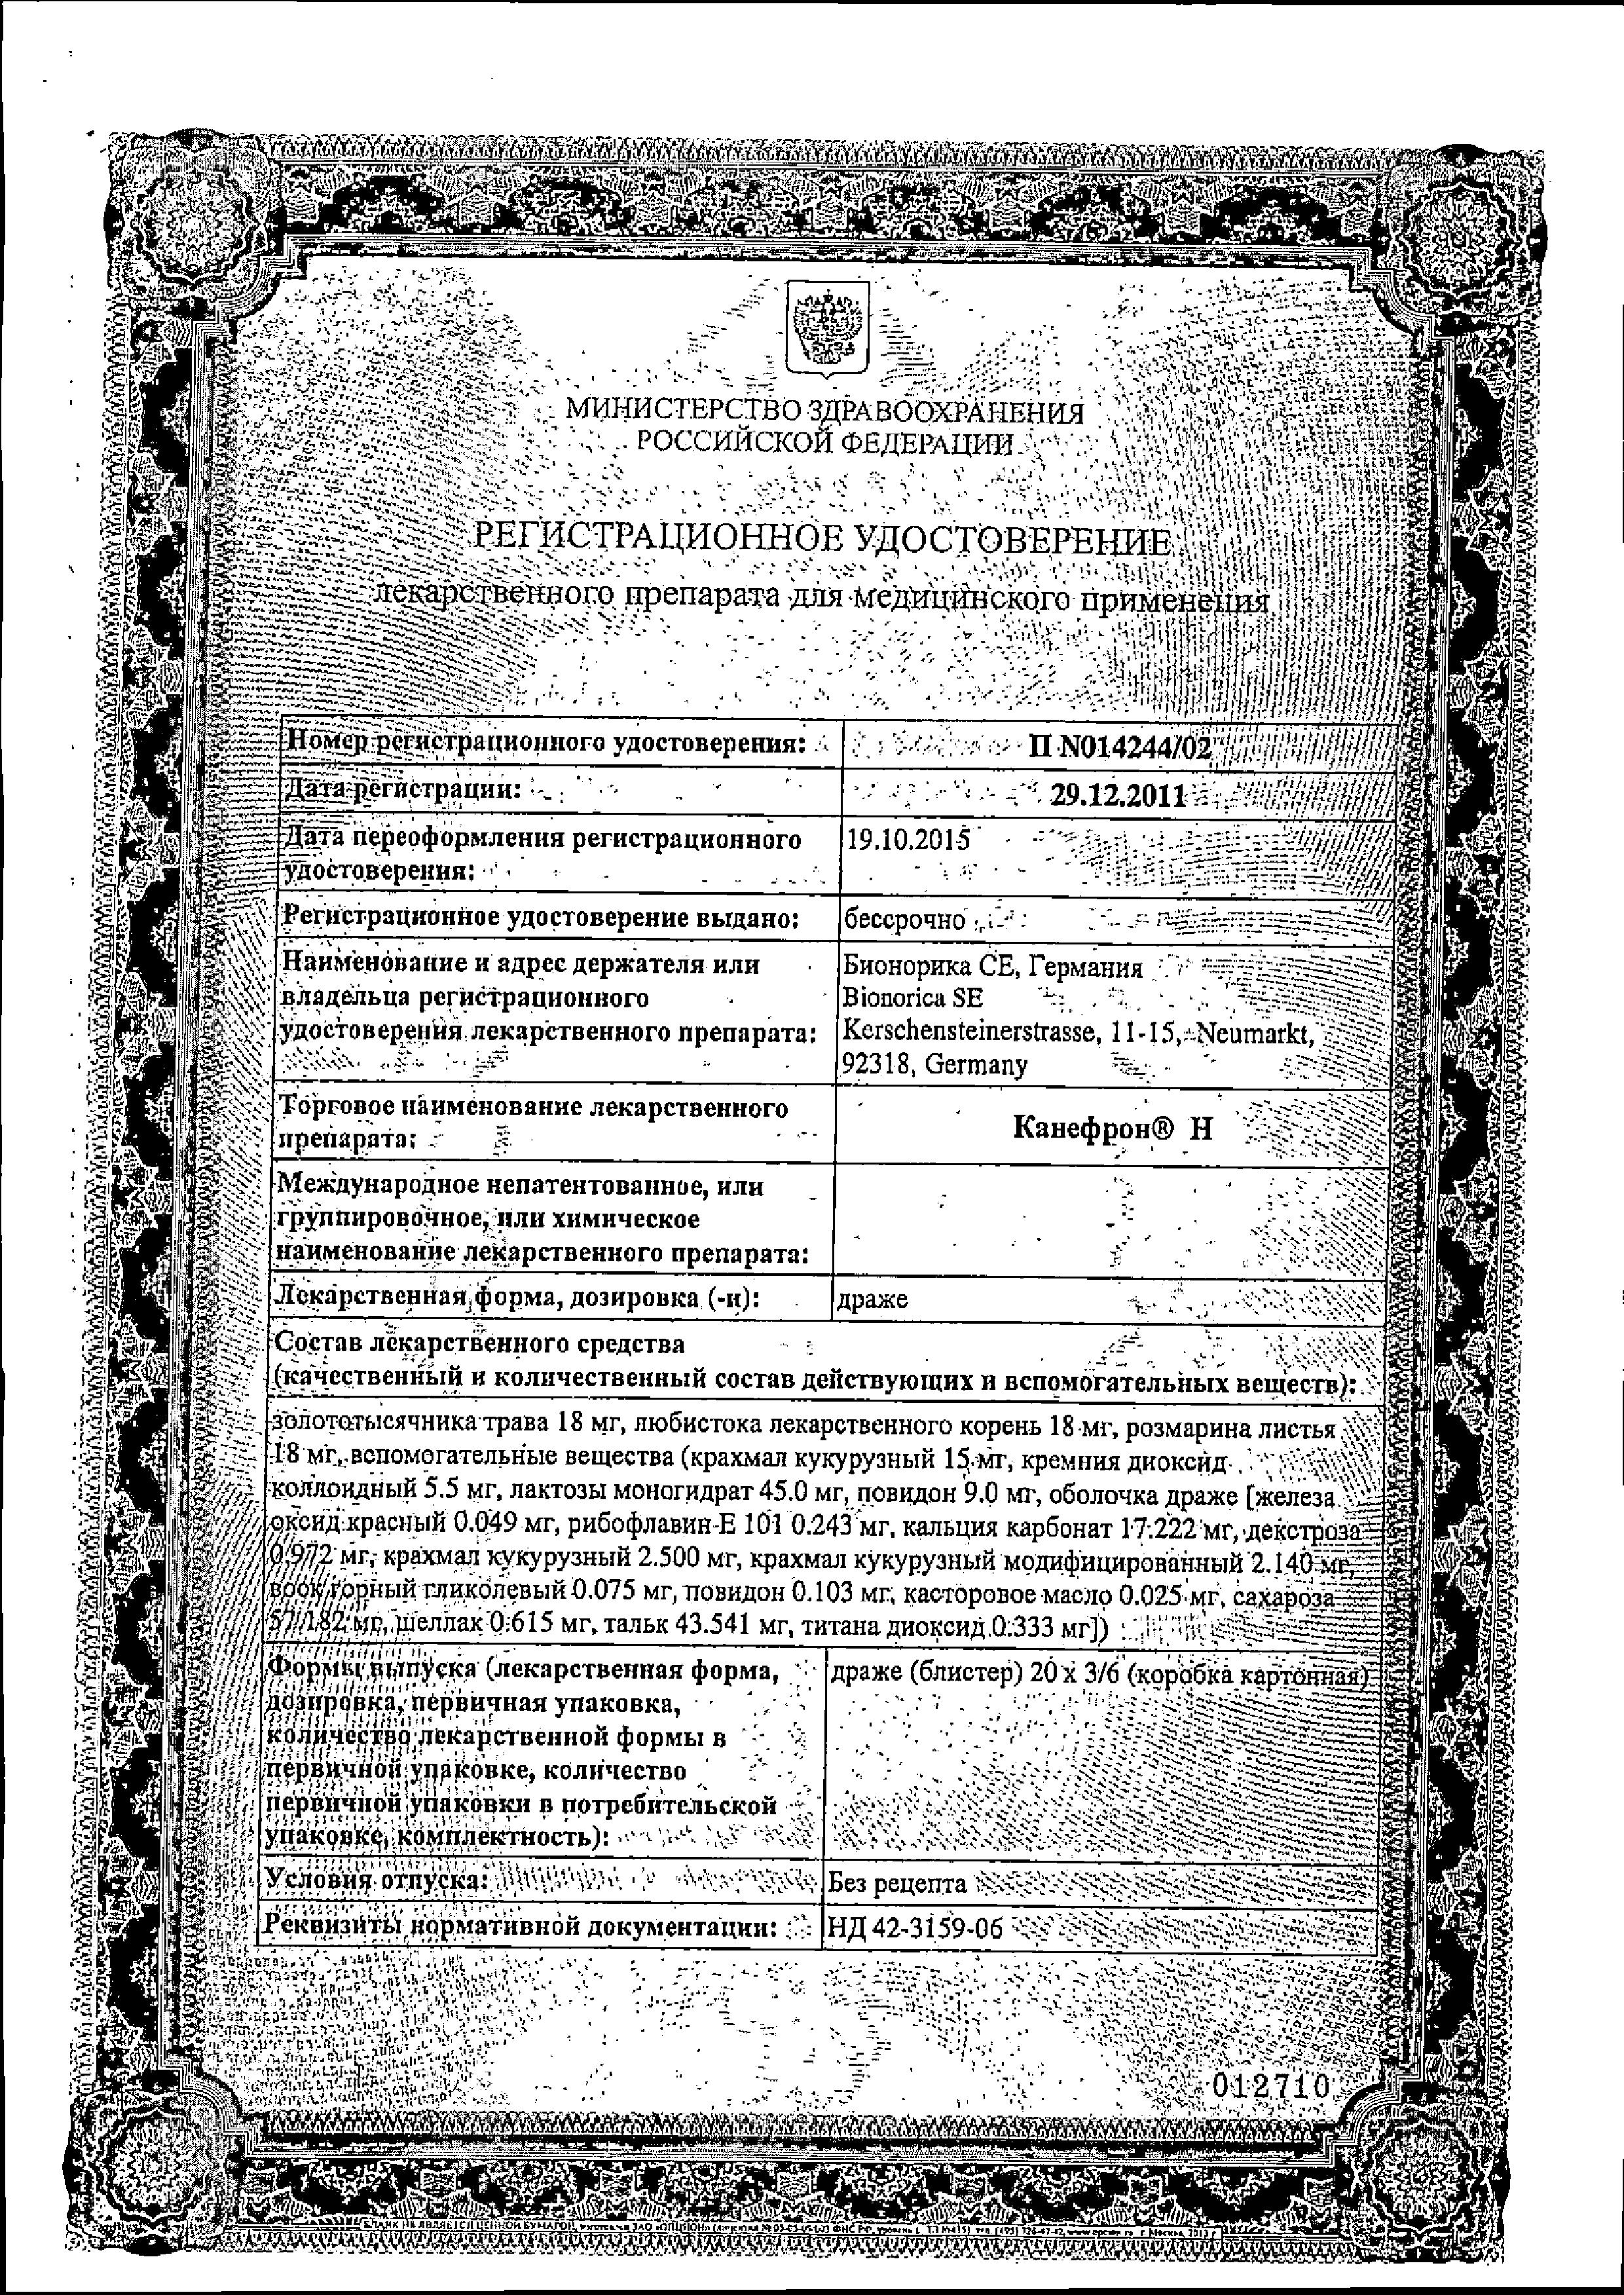 Канефрон H сертификат